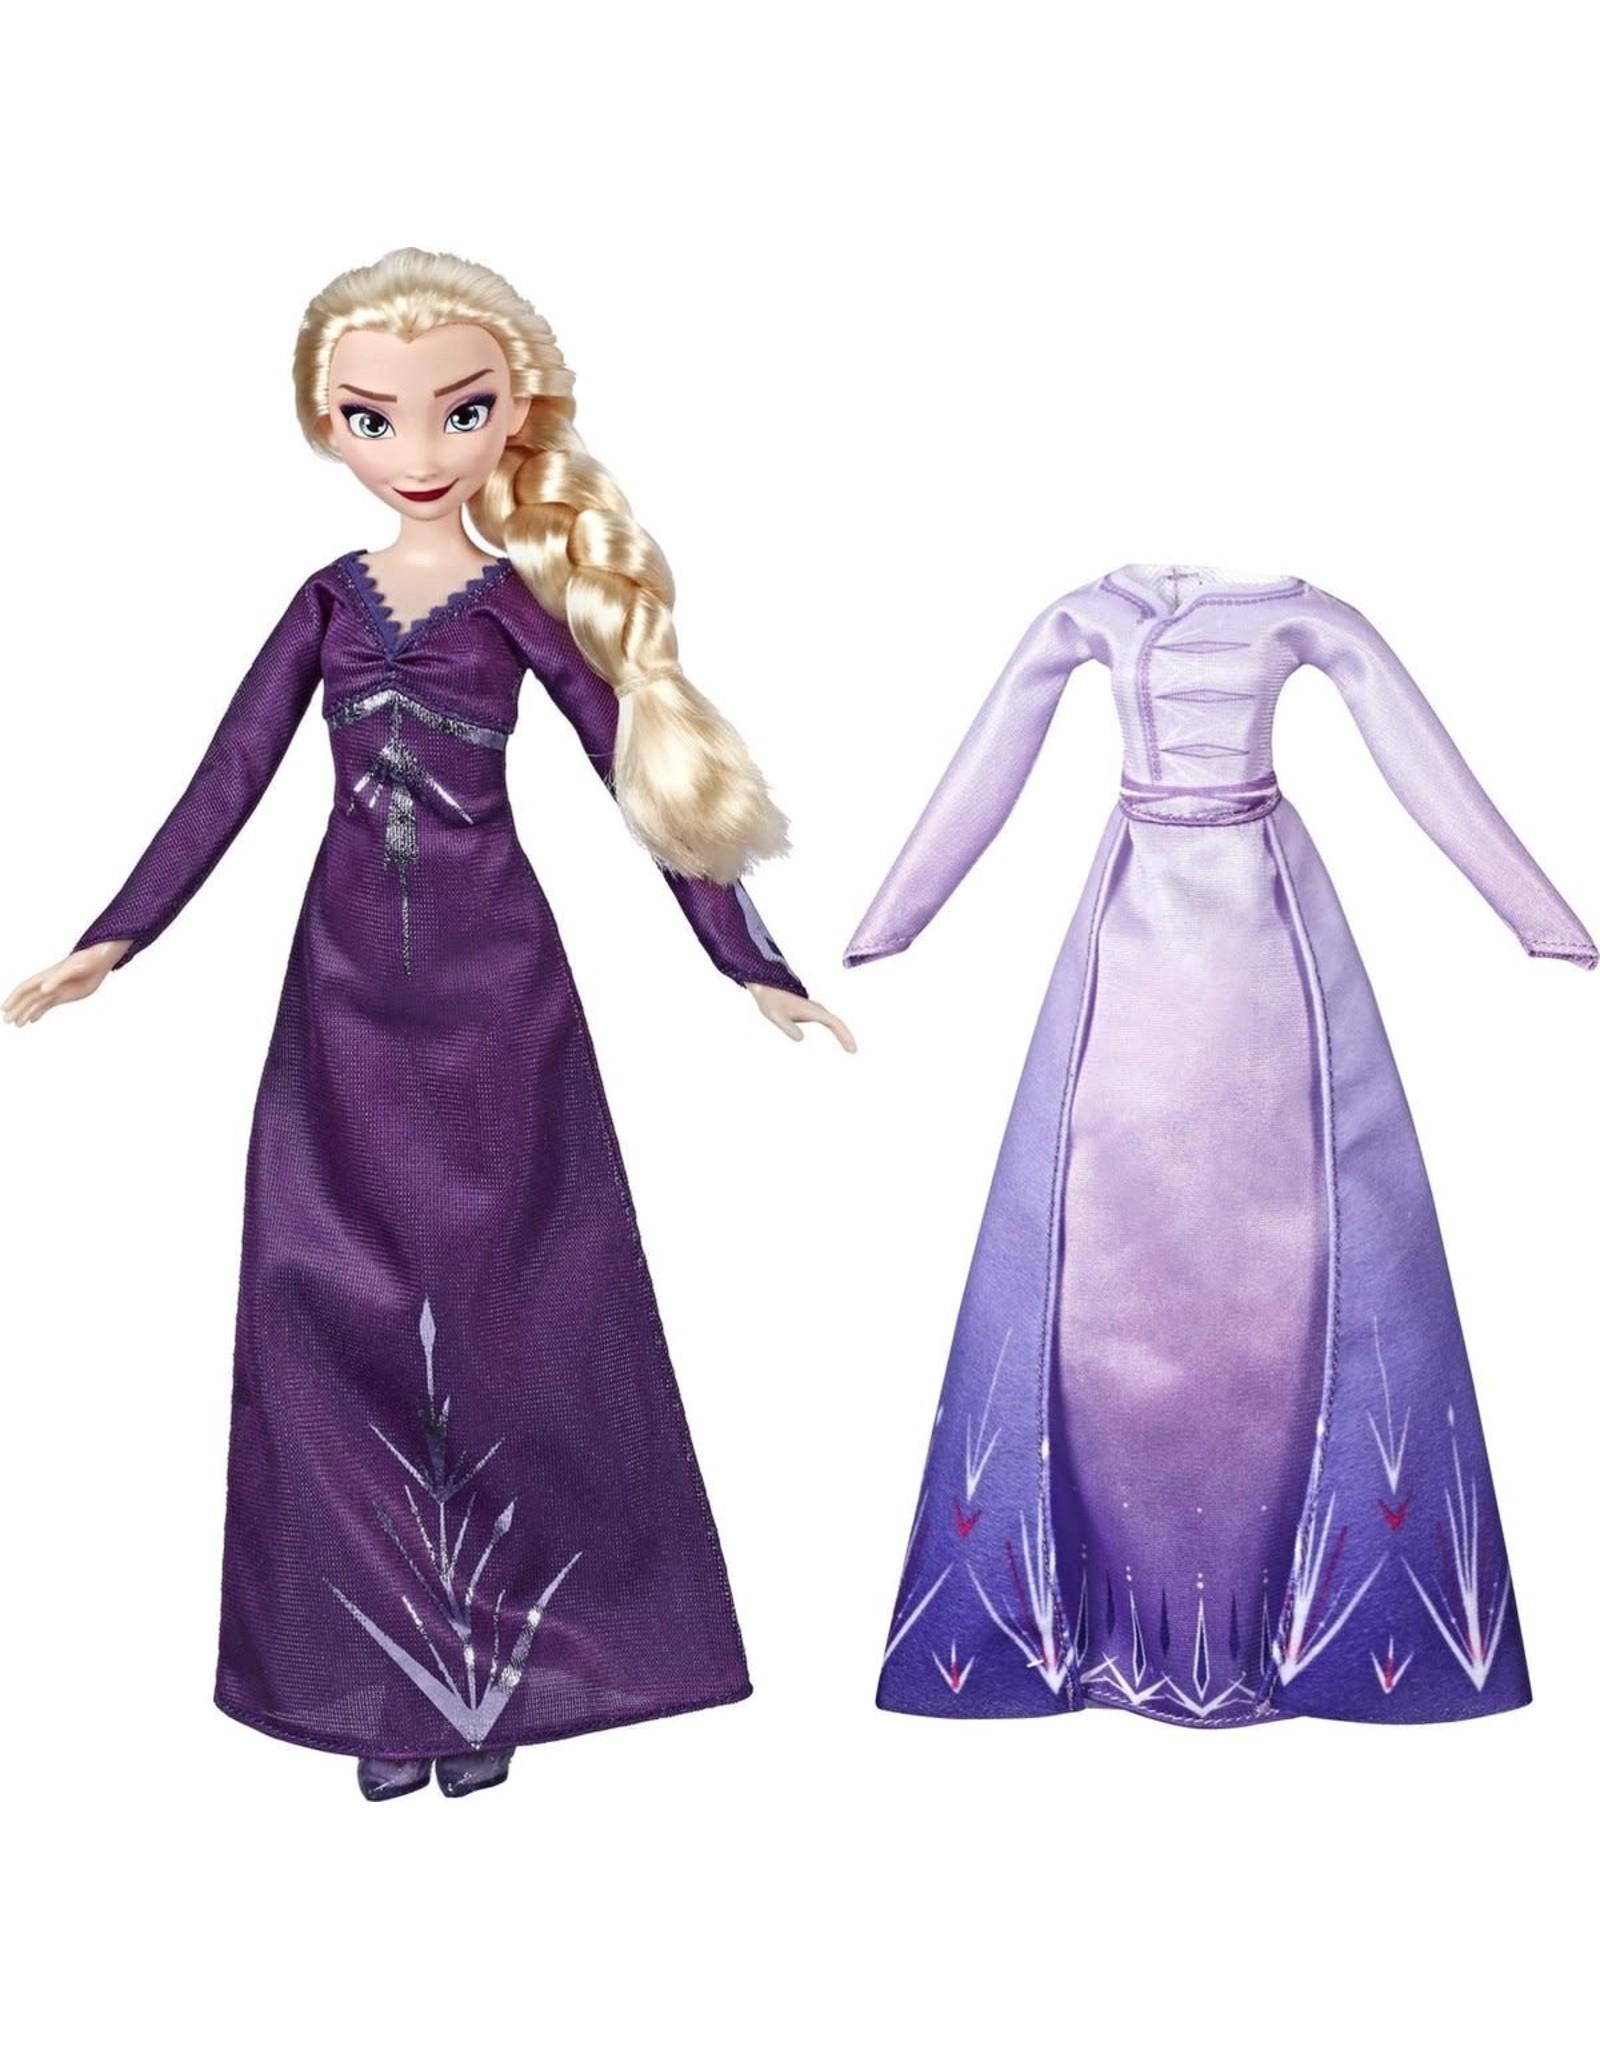 Frozen 2 Elsa - Arendelle Fashion - Modepop